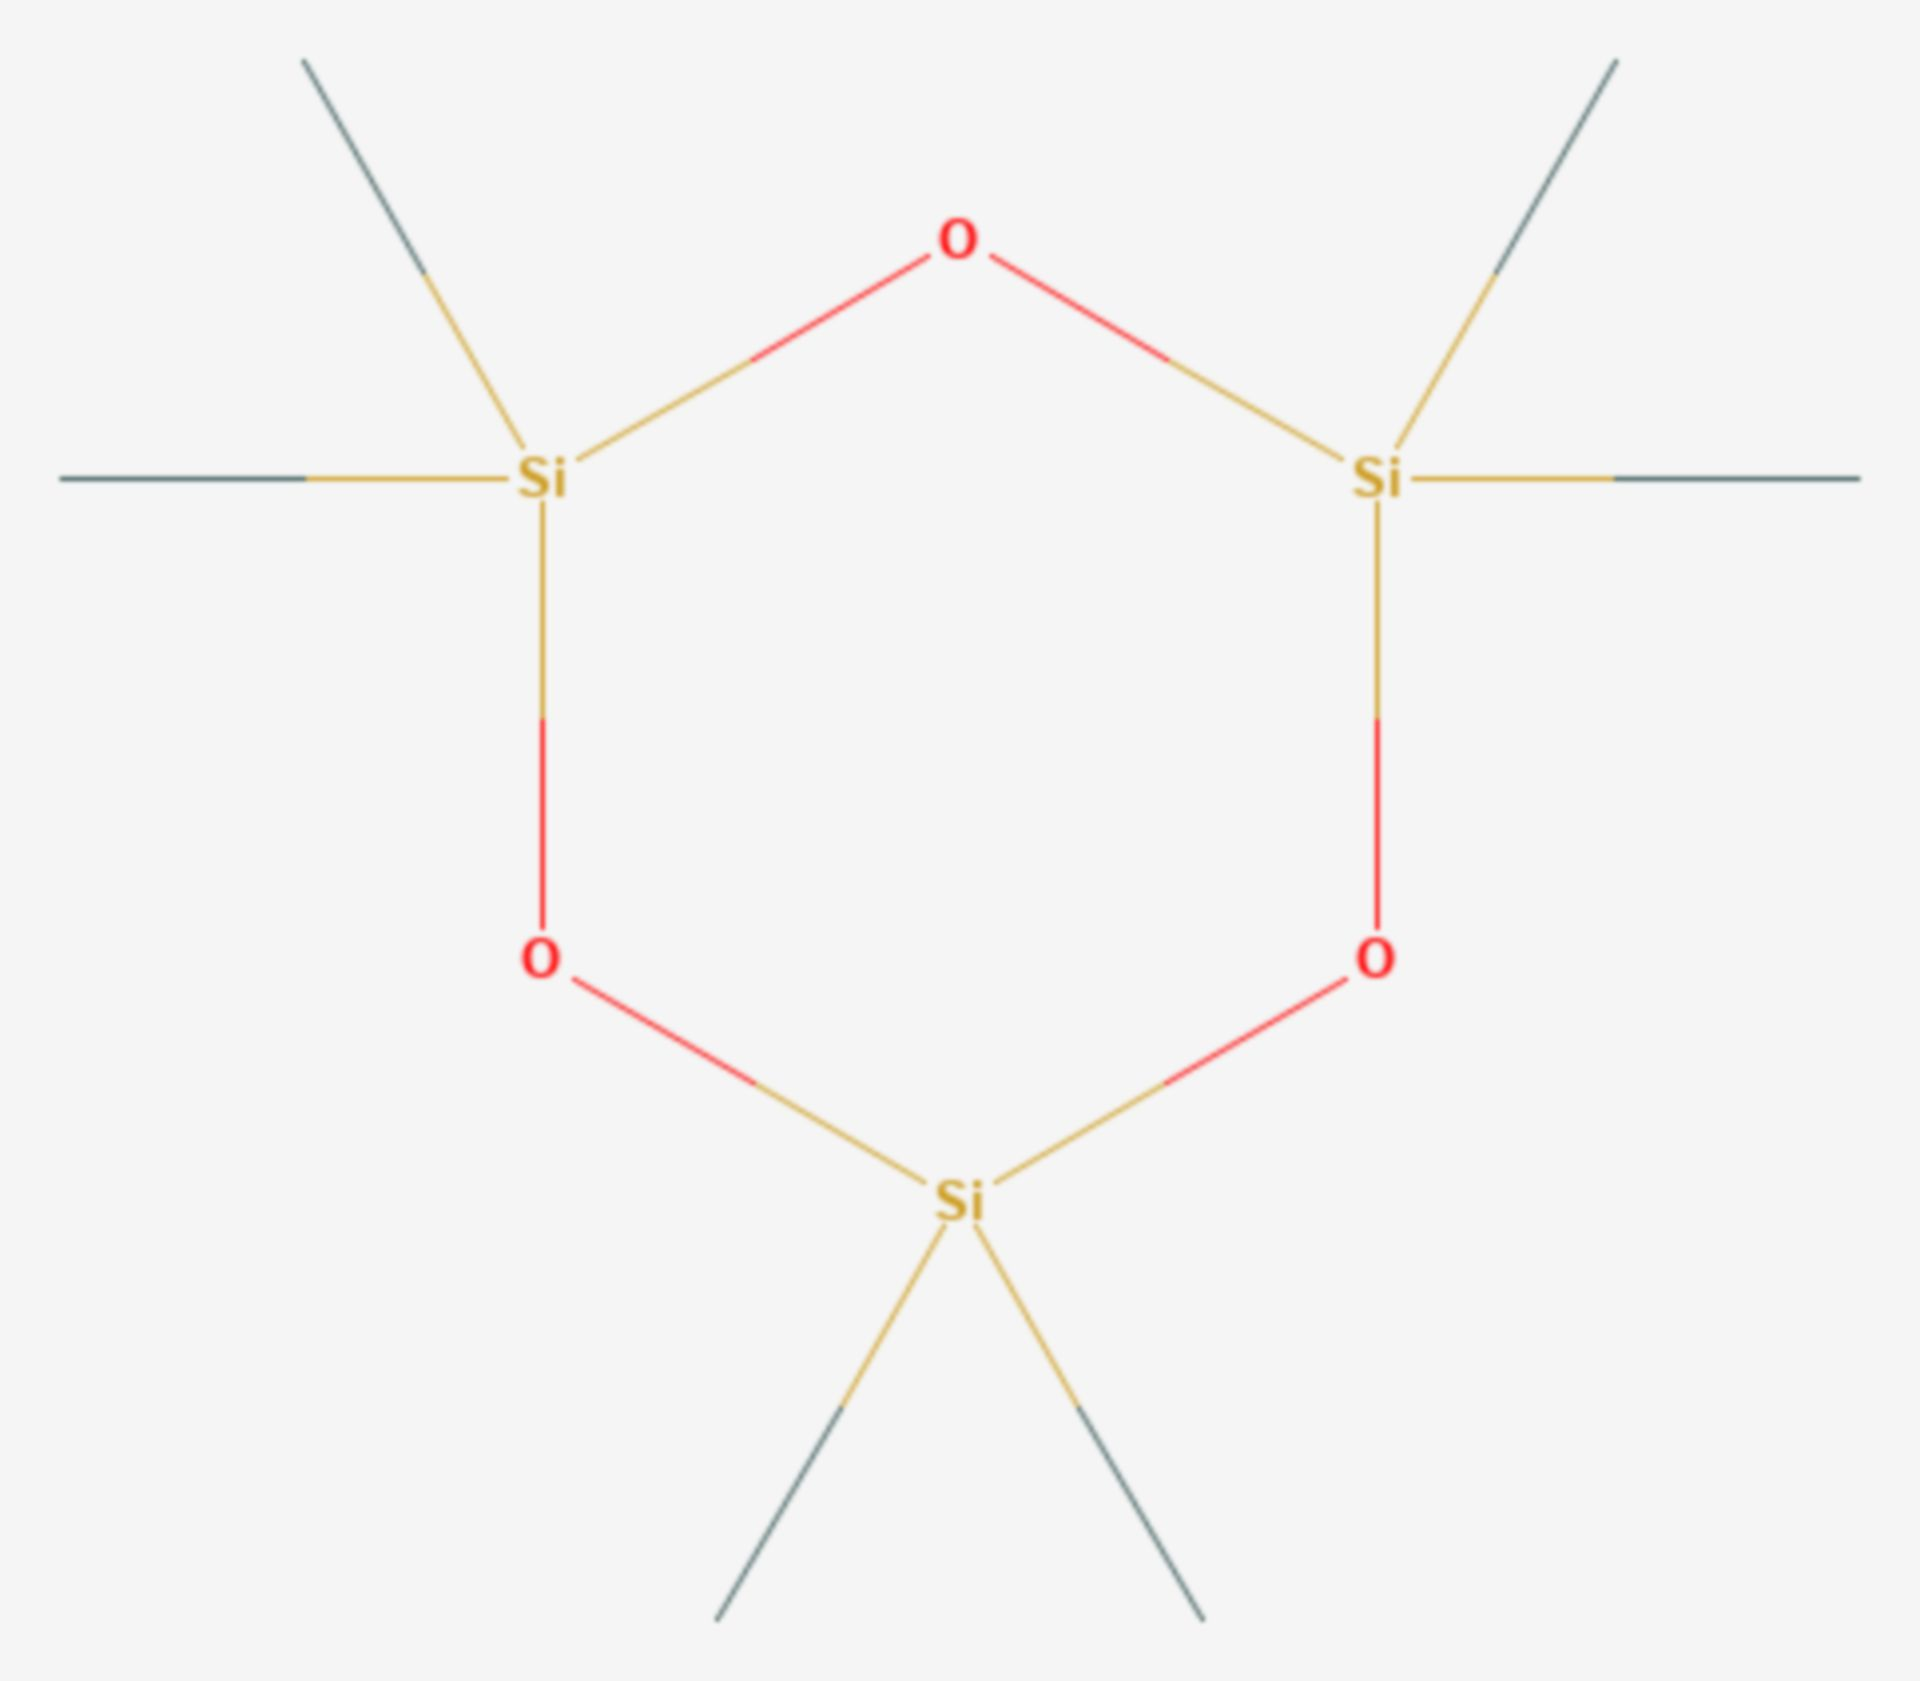 Hexamethylcyclotrisiloxan (Strukturformel)